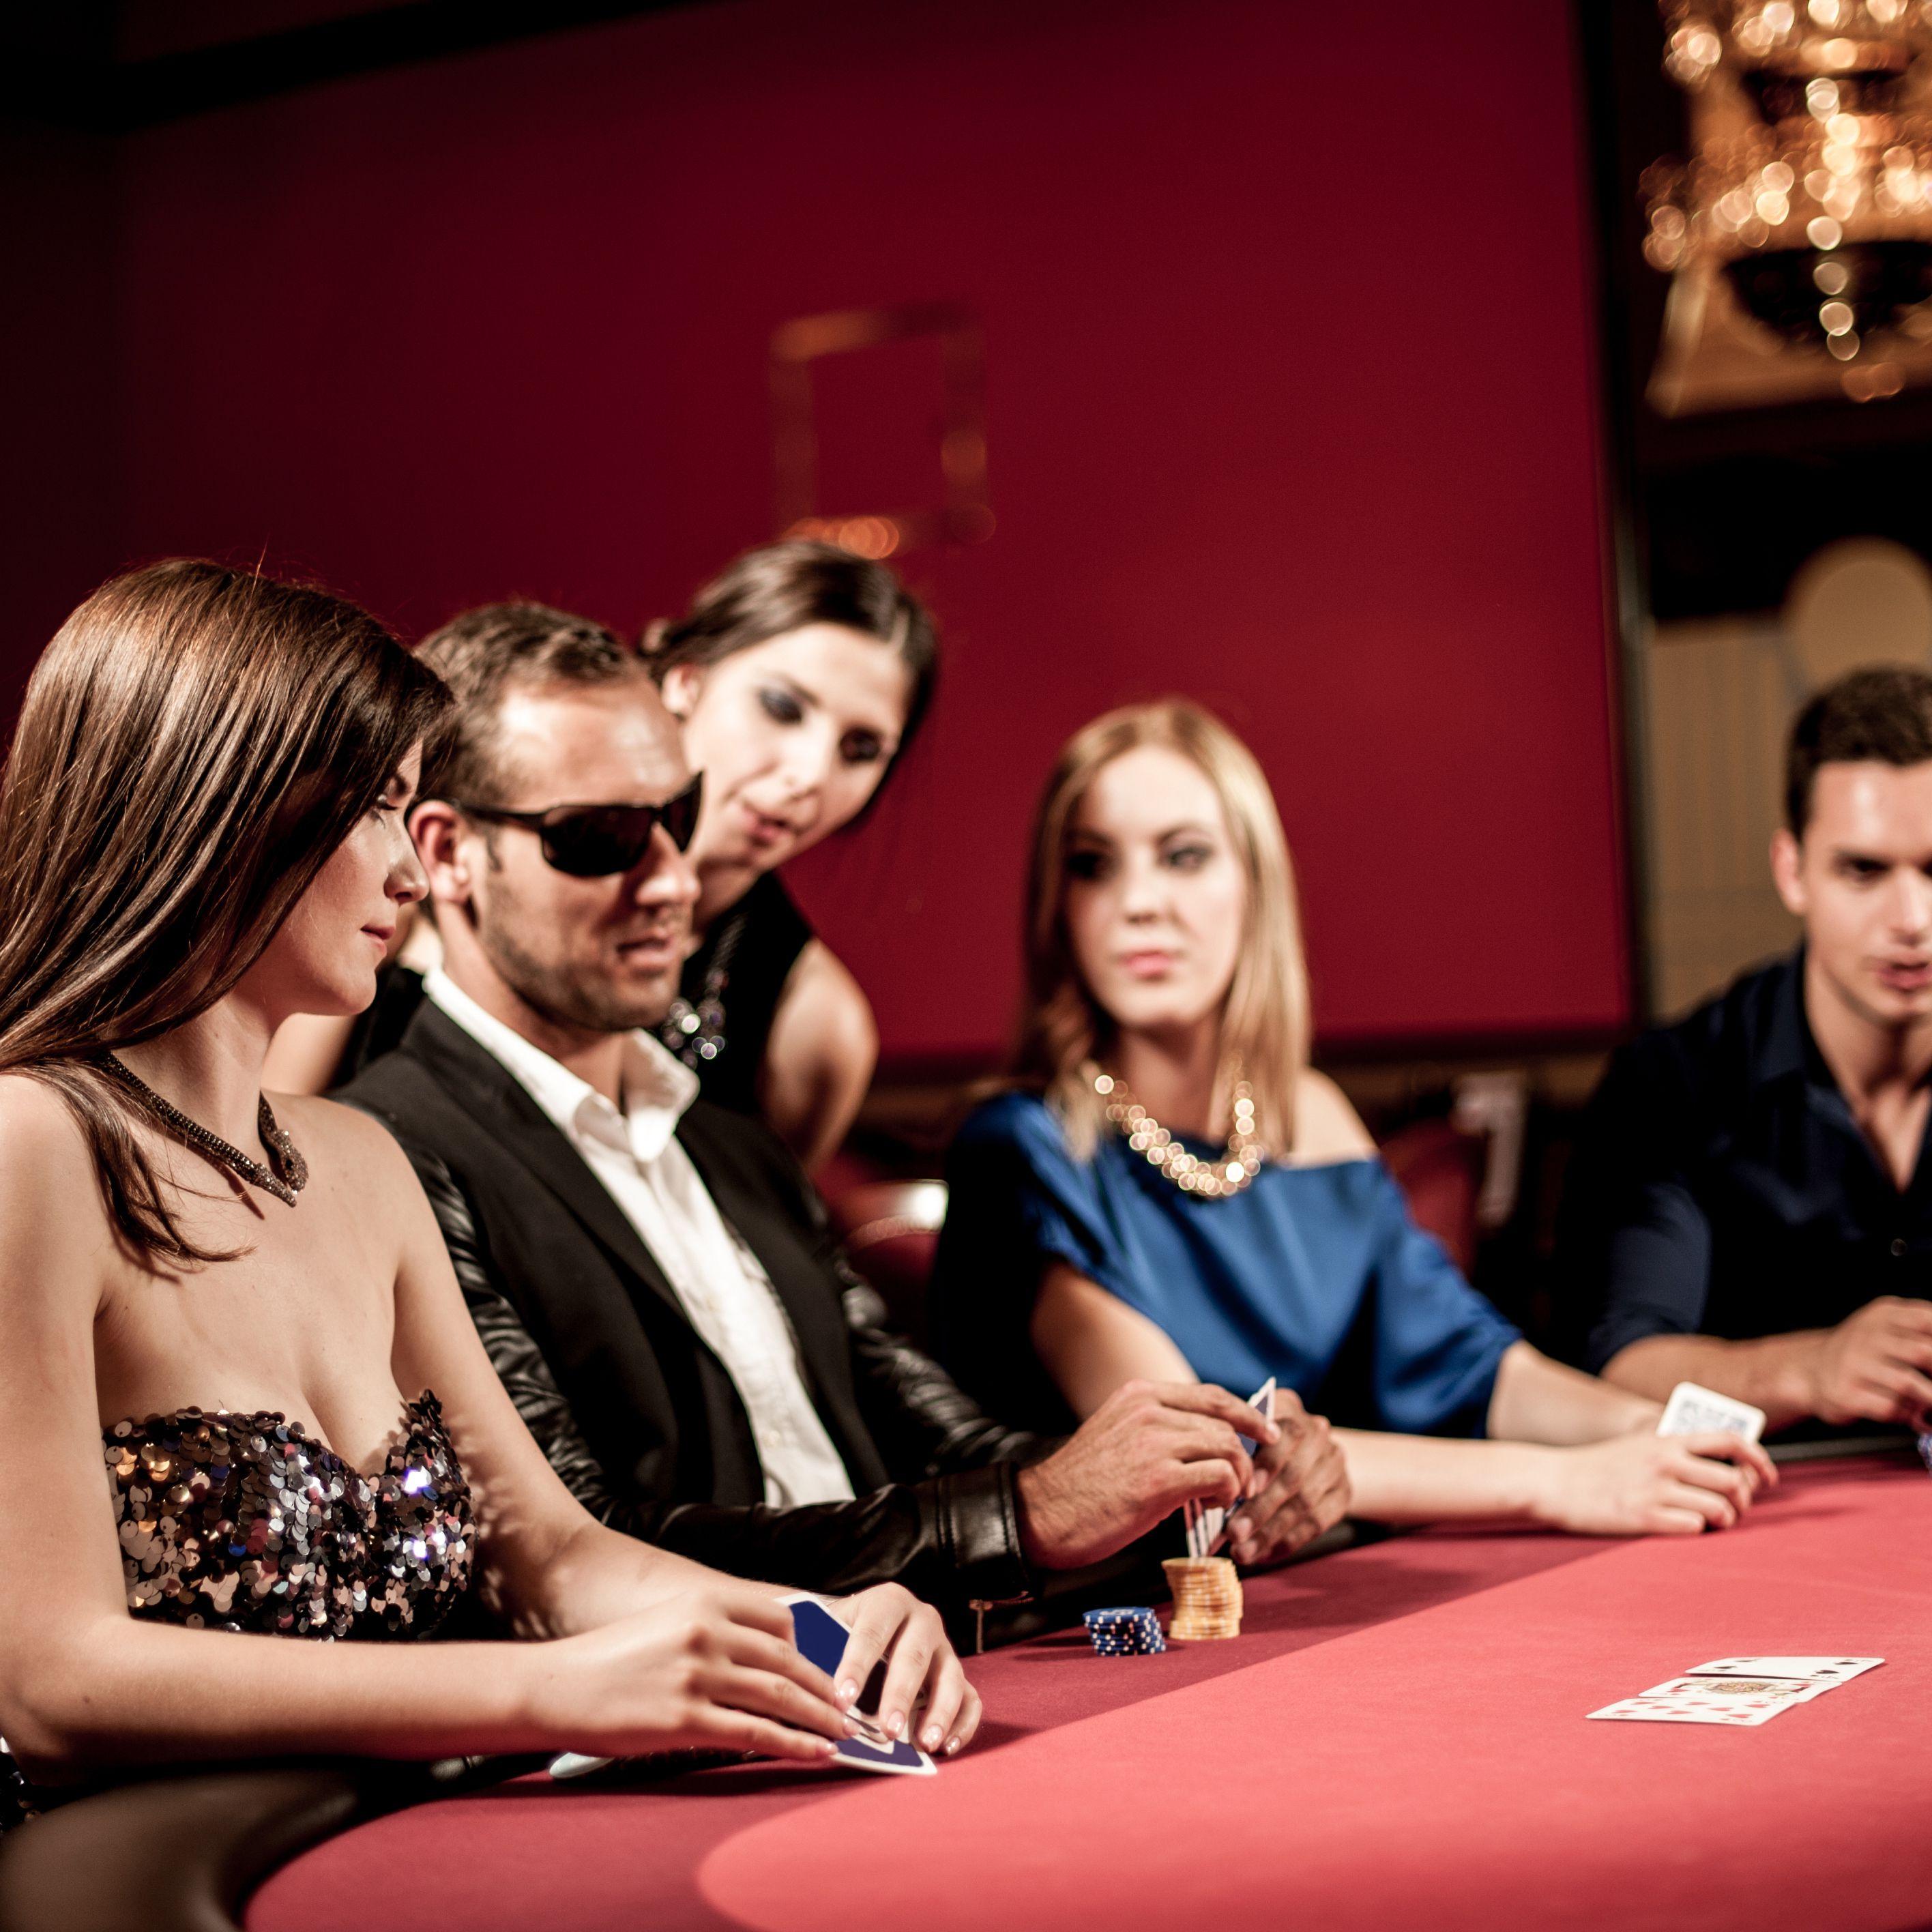 Poker betting tells nfl betting advice week 2